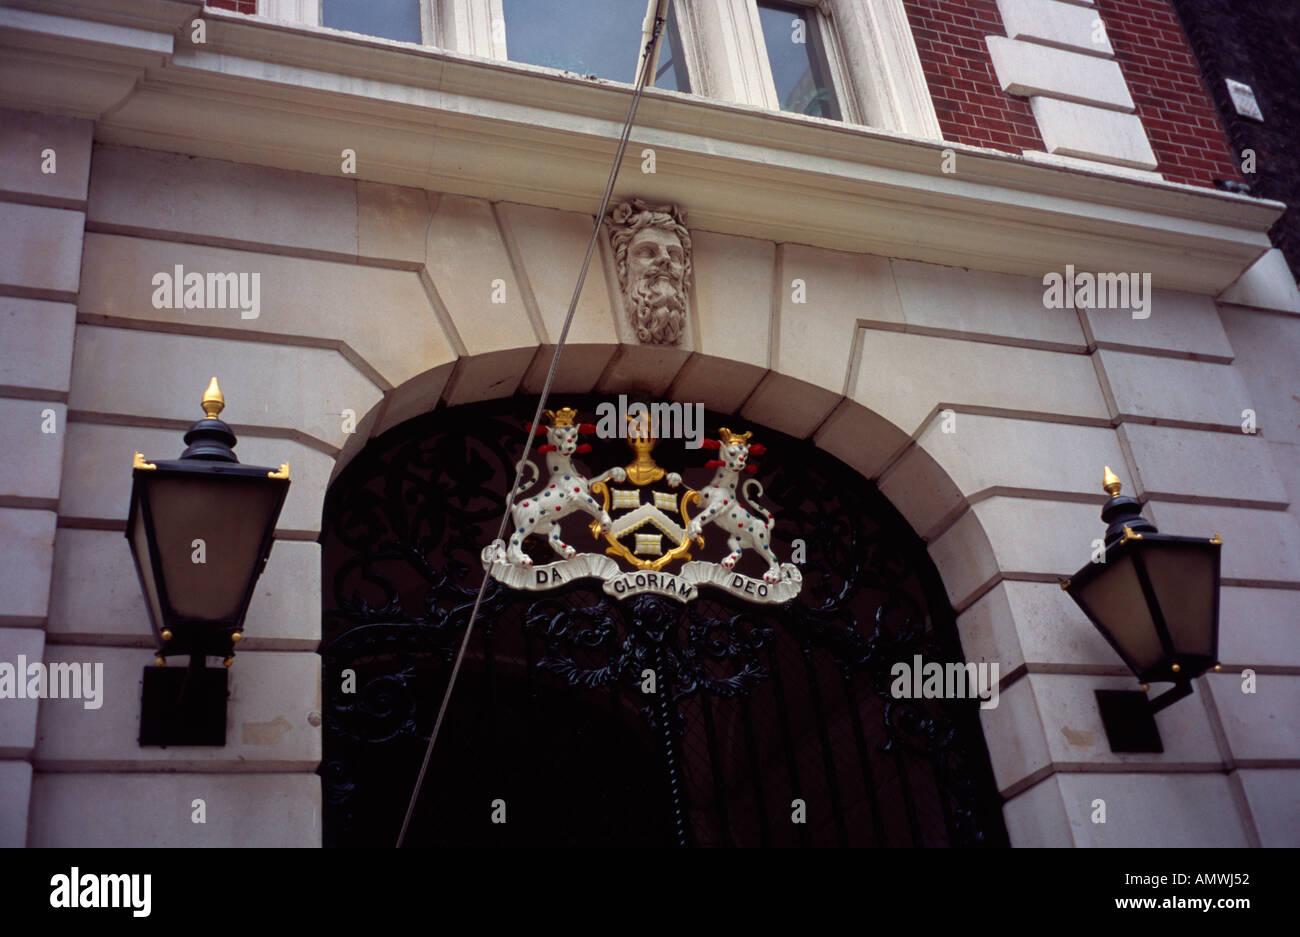 Dyers Hall, 10 Dowgate Hill, London, England EC4 - Stock Image